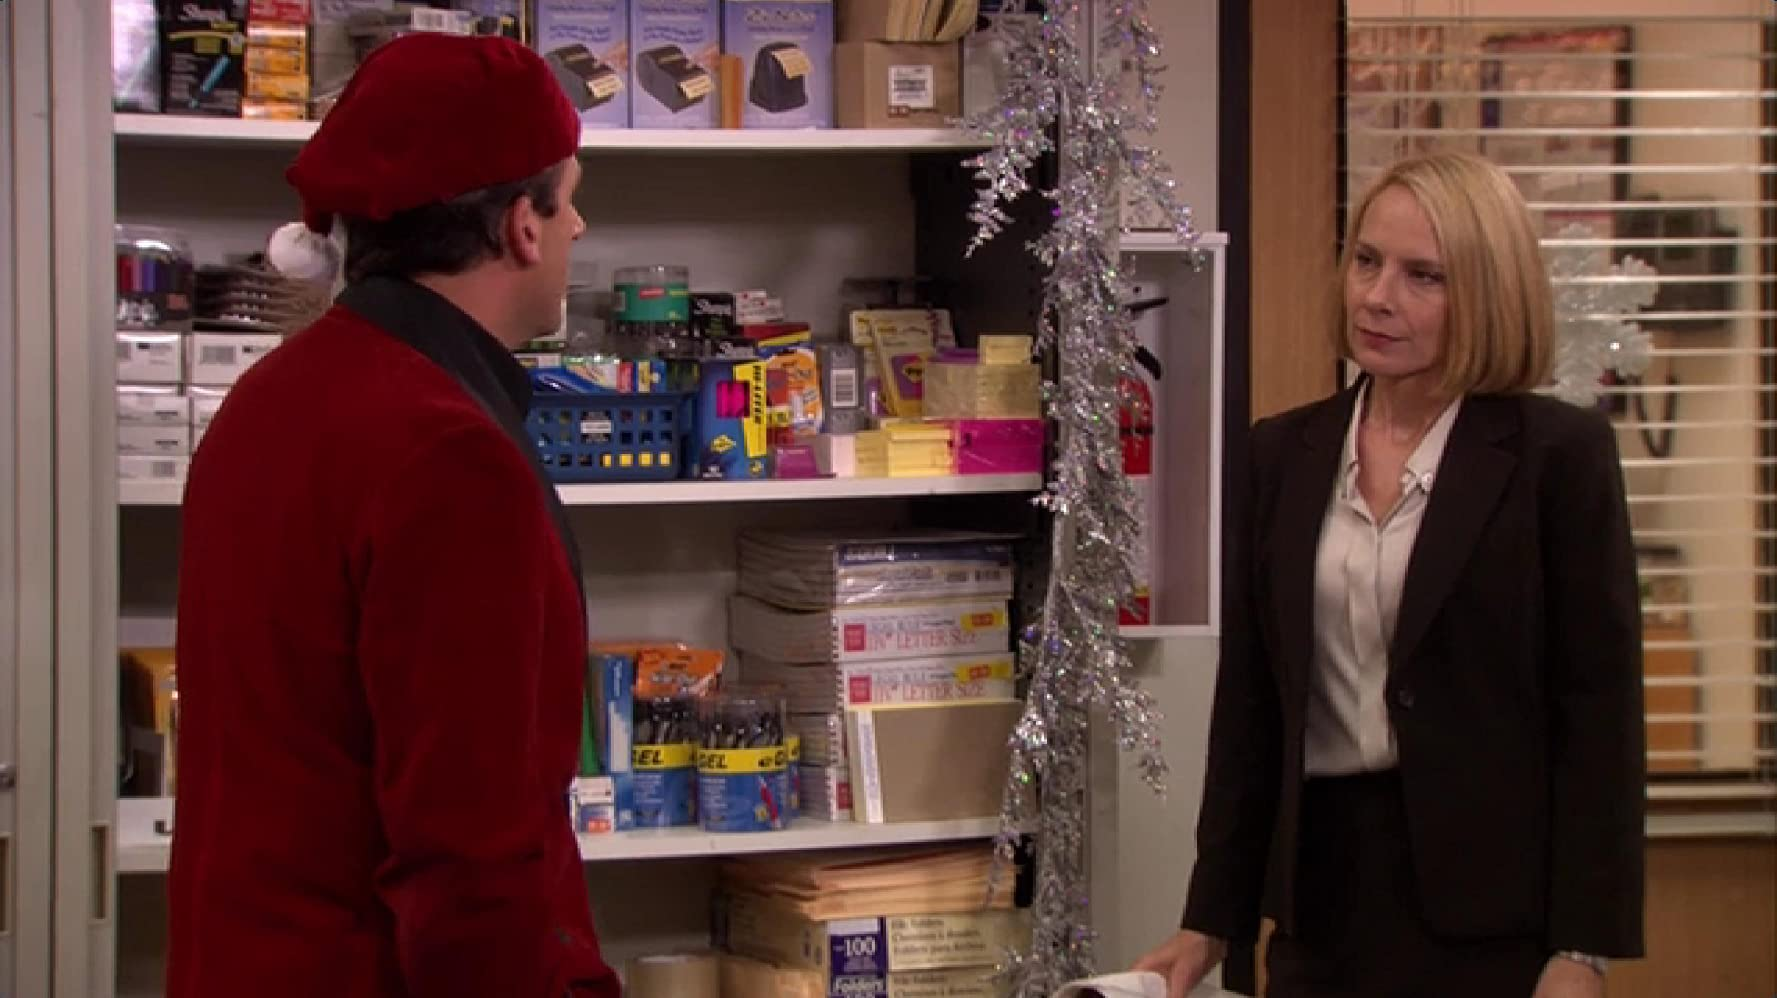 classy christmas 2010 - Classy Christmas The Office